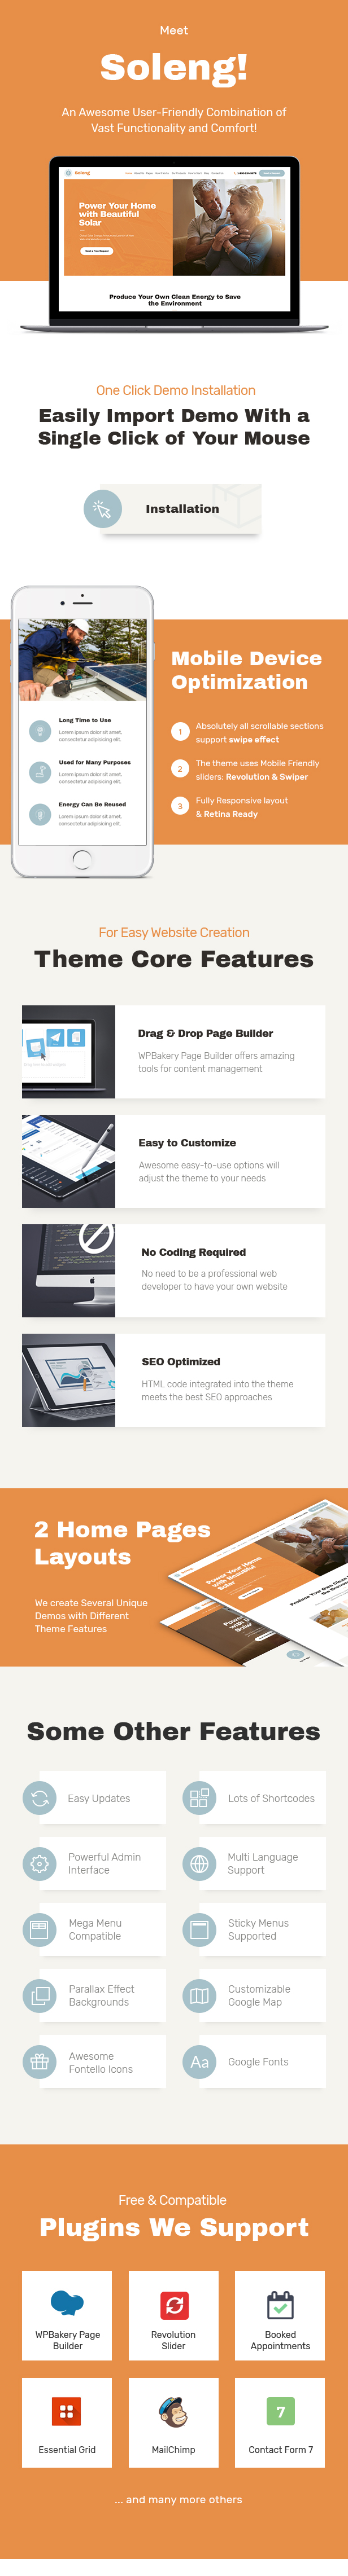 Soleng | A Solar Energy Company WordPress Theme - 1